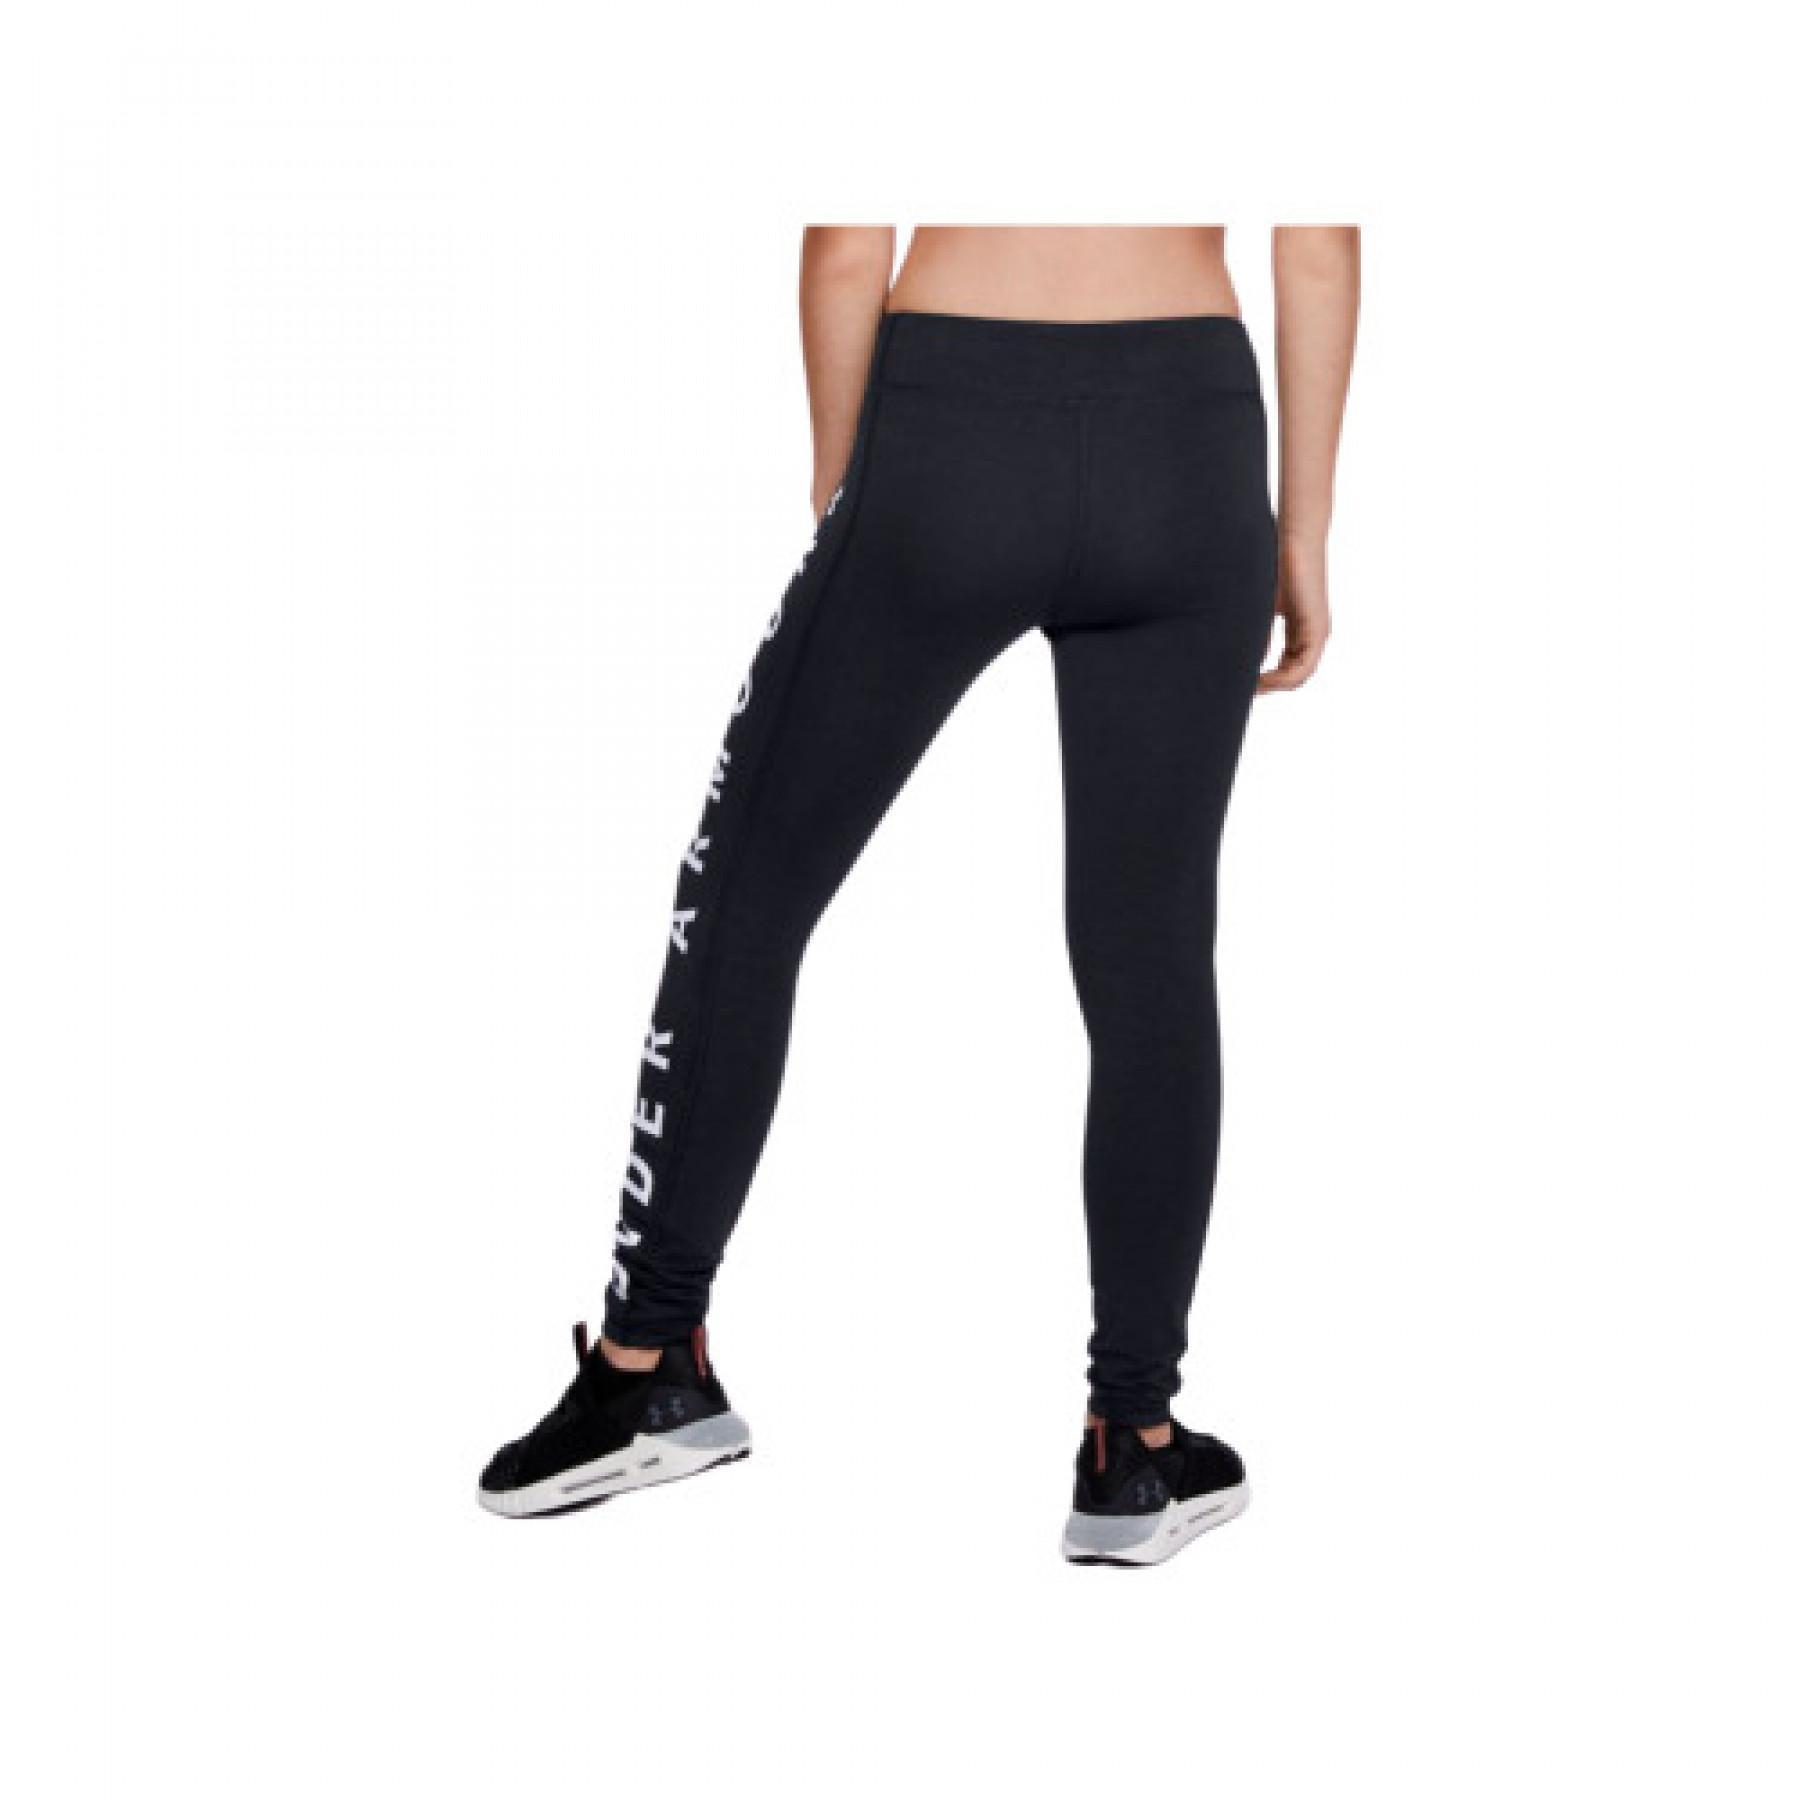 Legging Under Armour daughter sportstyle Branded